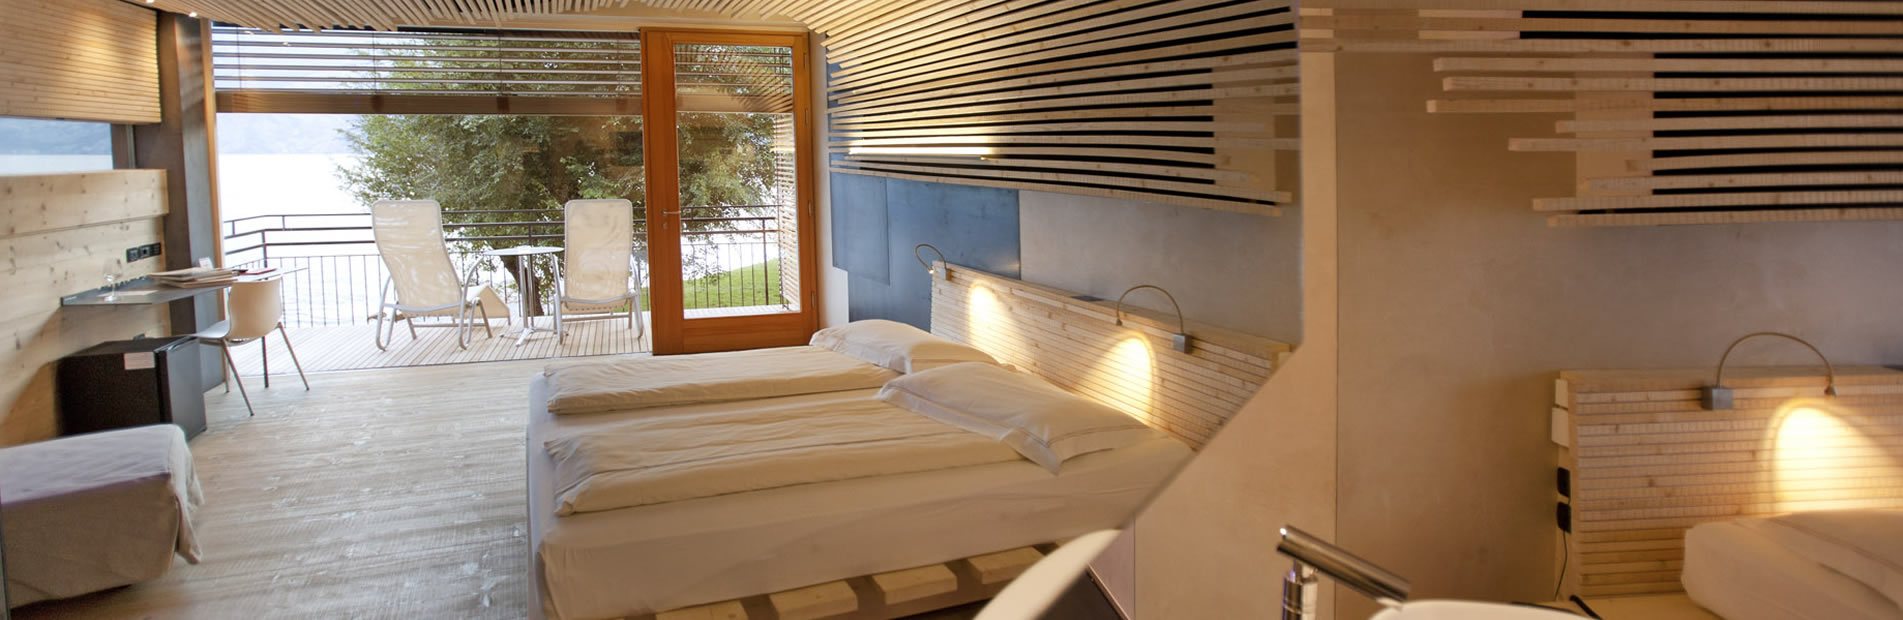 ambient hotel primaluna hotel in malcesine on garda lake. Black Bedroom Furniture Sets. Home Design Ideas